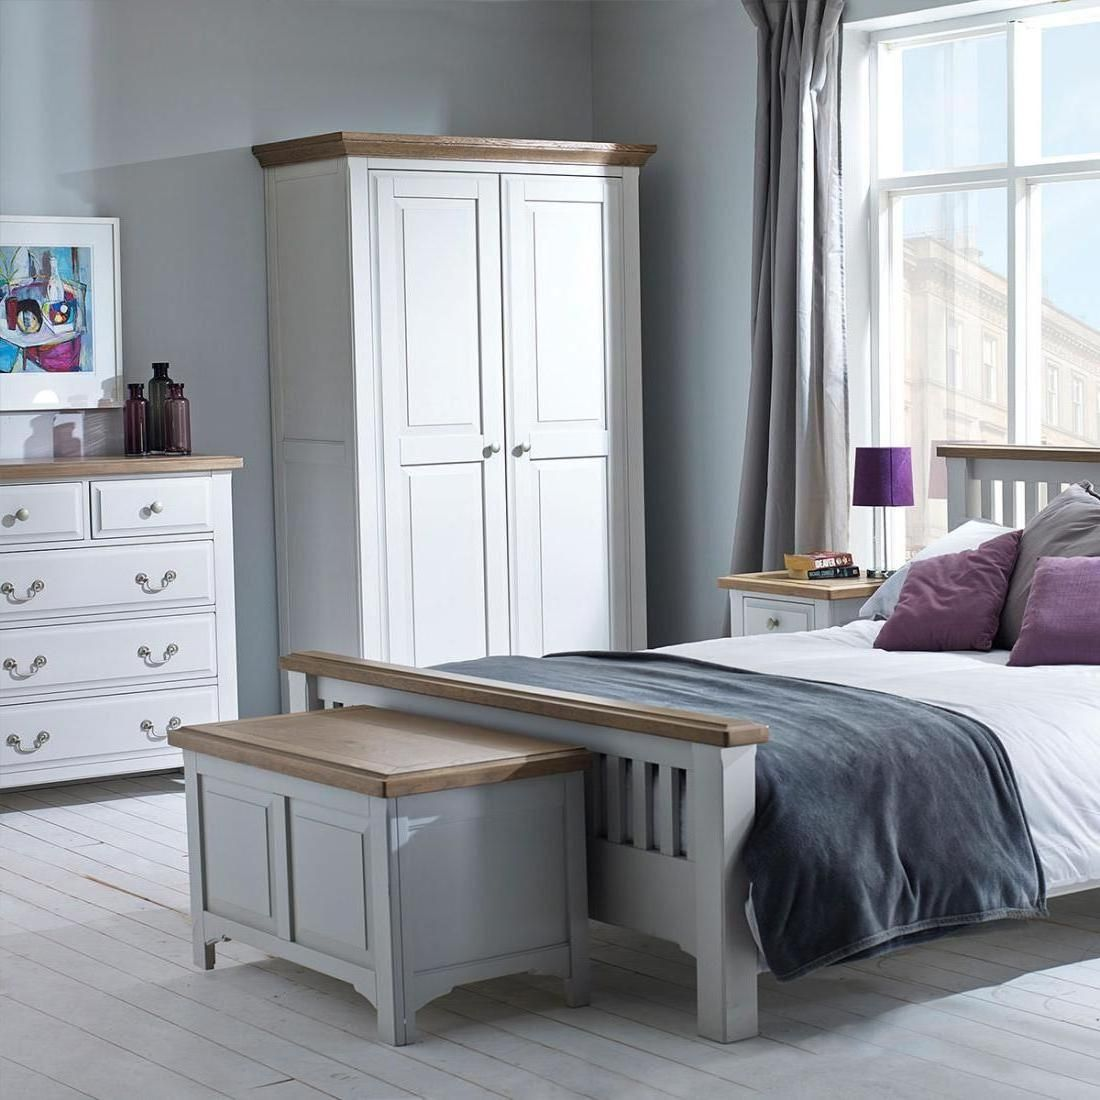 40 Stunning Grey Bedroom Furniture Ideas Designs And Styles Interiorsherpa Grey Bedroom Furniture Furniture Grey Bedroom